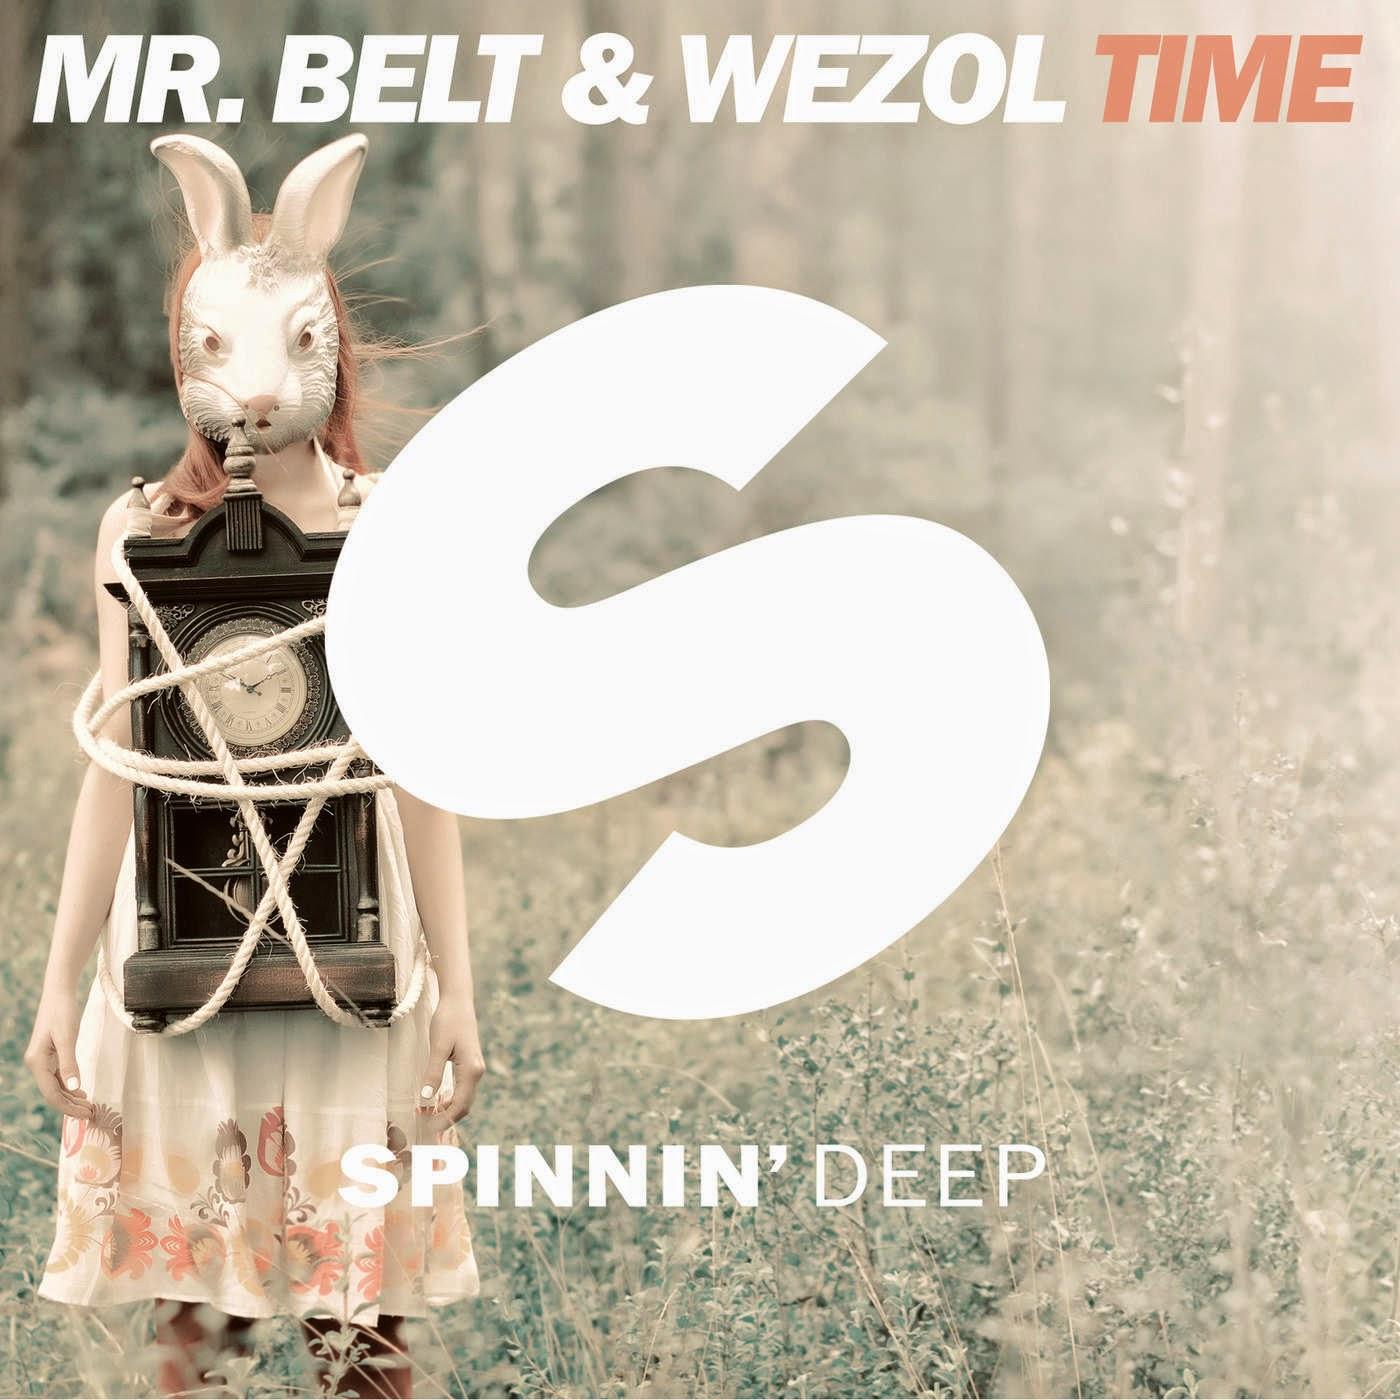 Mr Belt & Wezol - Time - Single